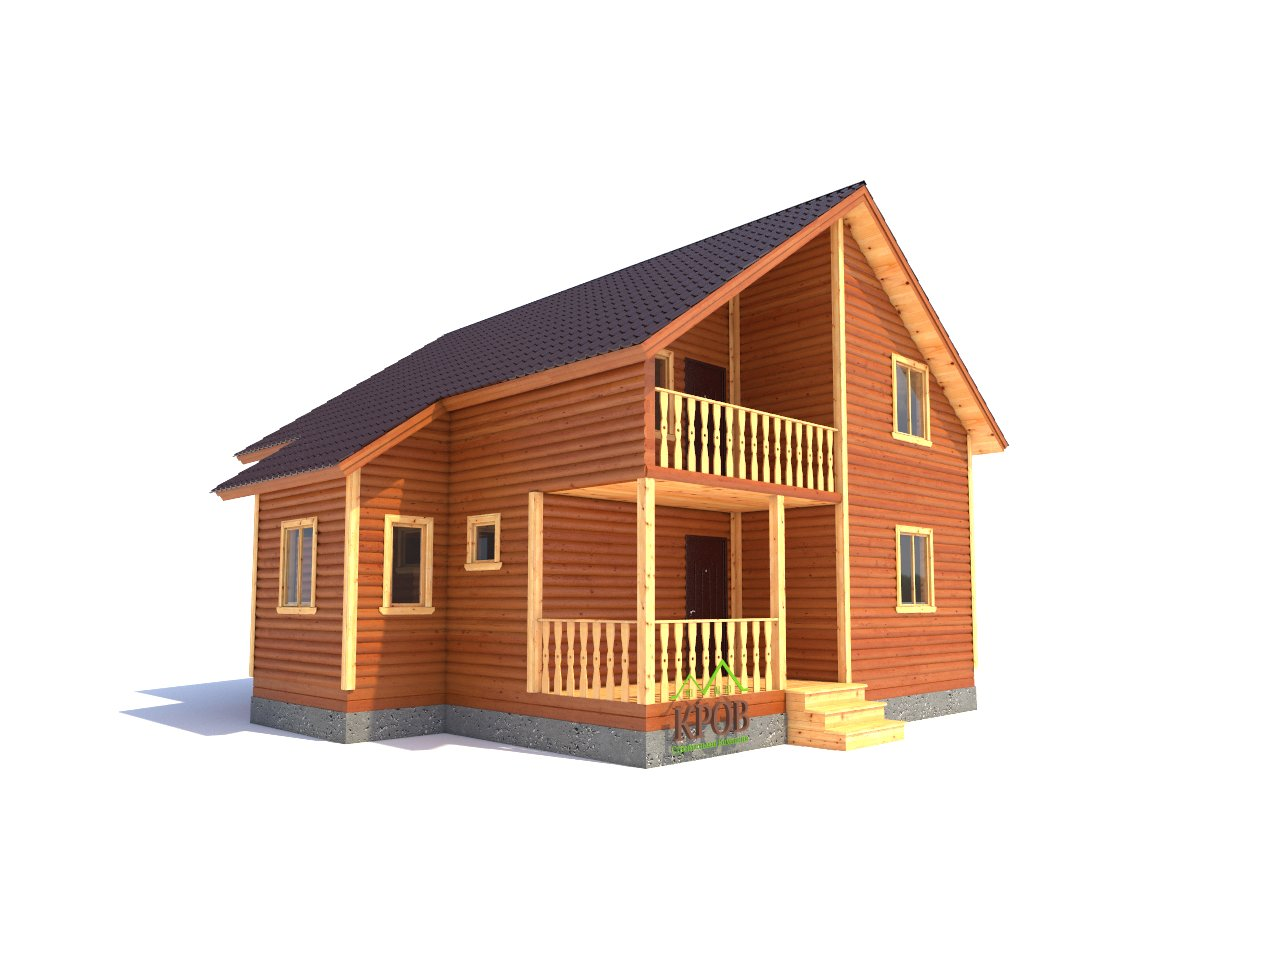 Полутораэтажный дом из бруса 10х9,5 м